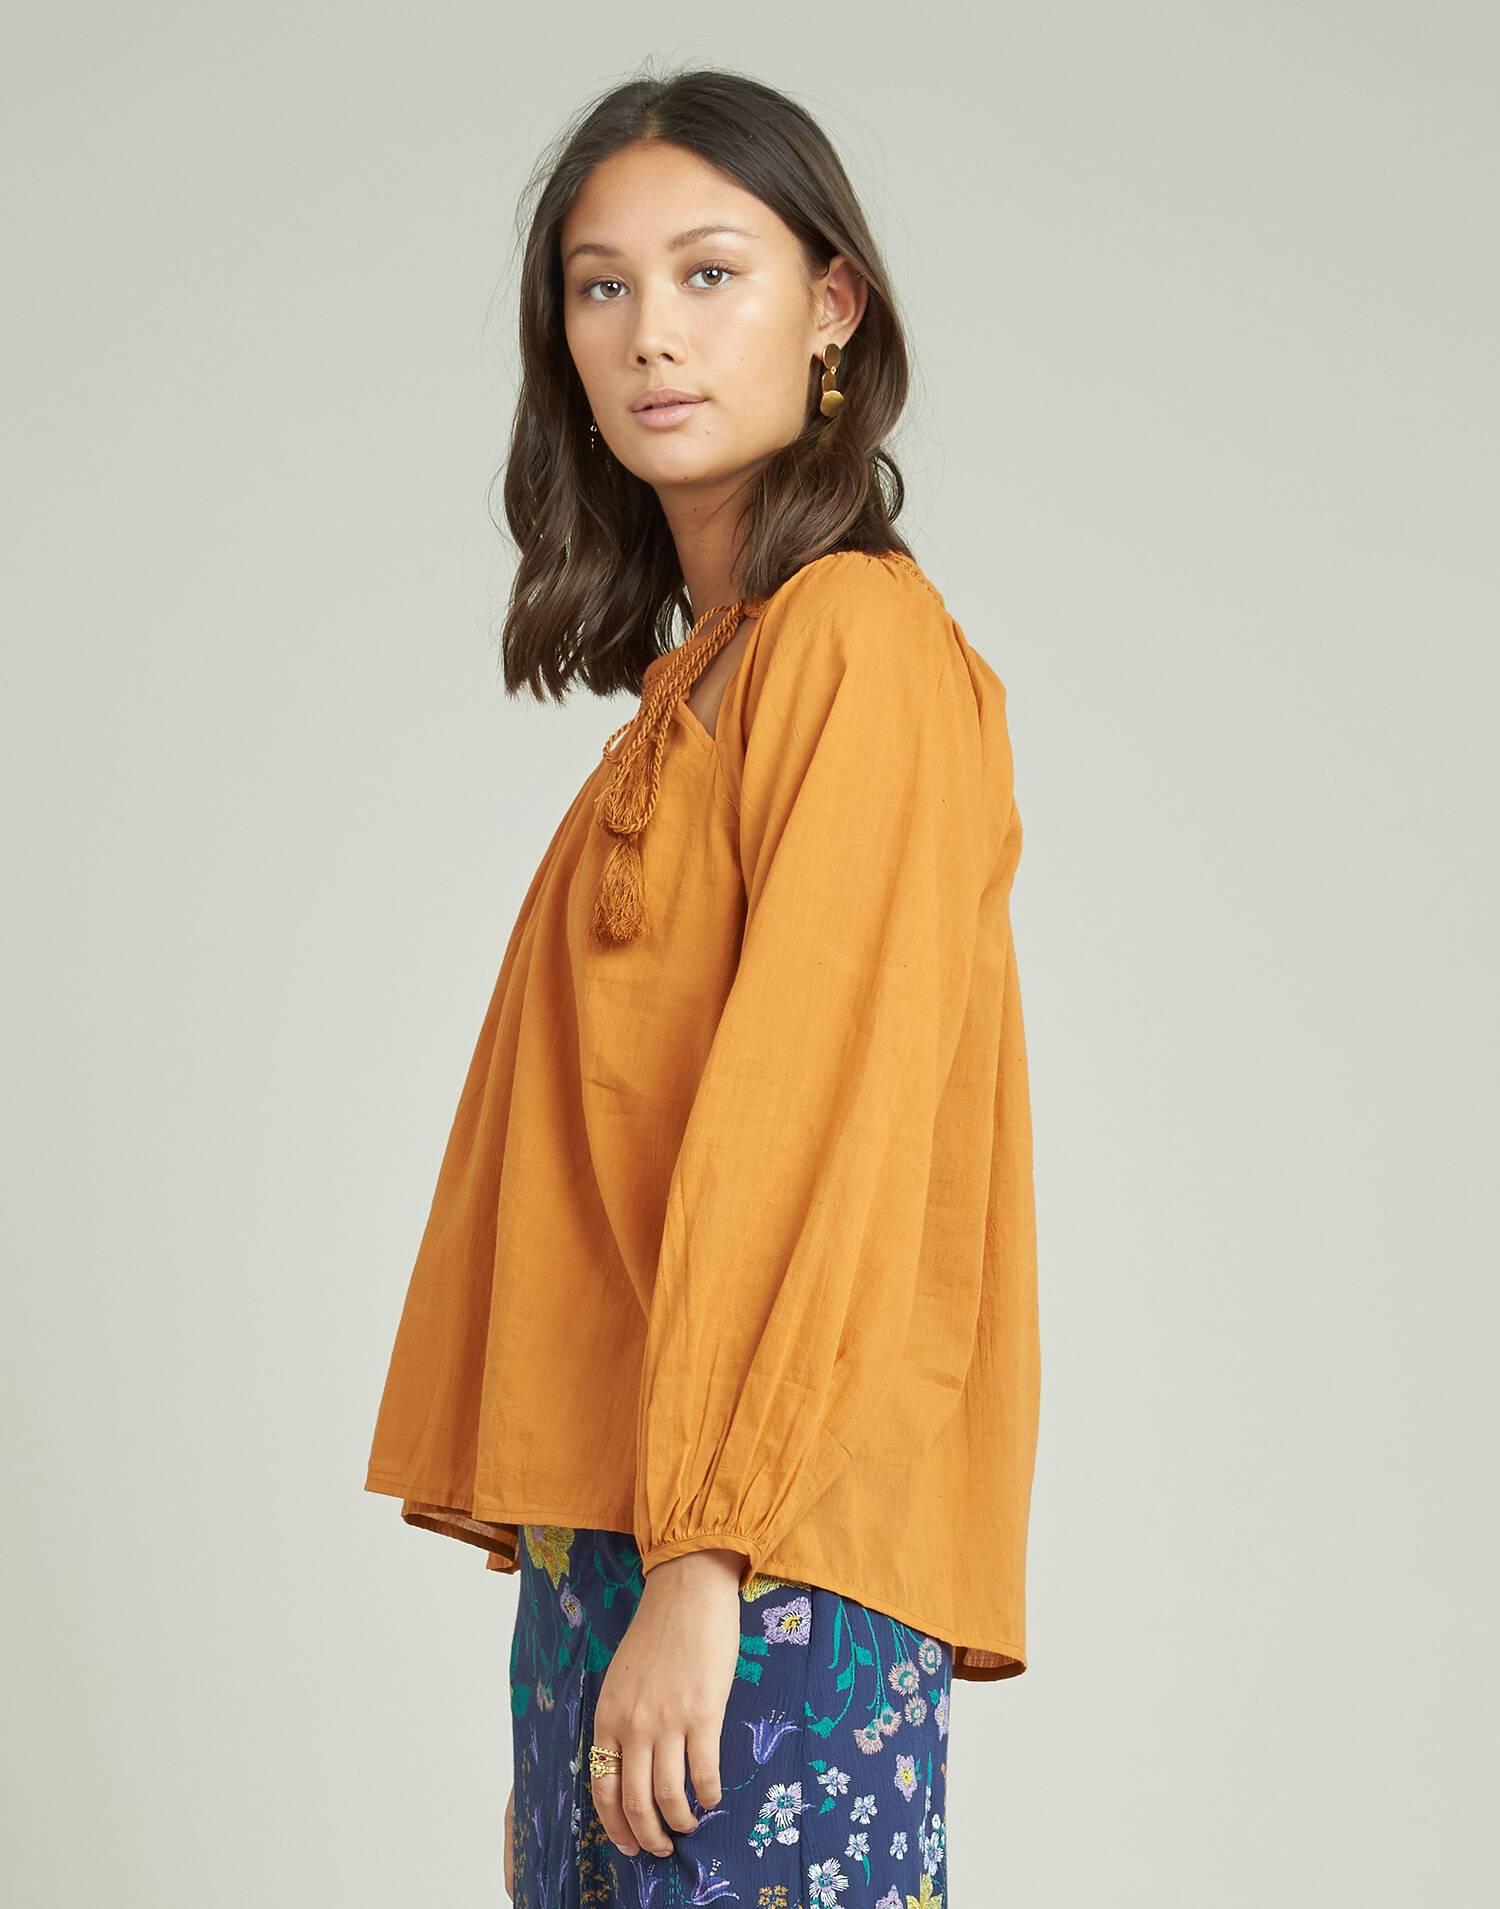 Camisa manga larga cuello canilla bordado